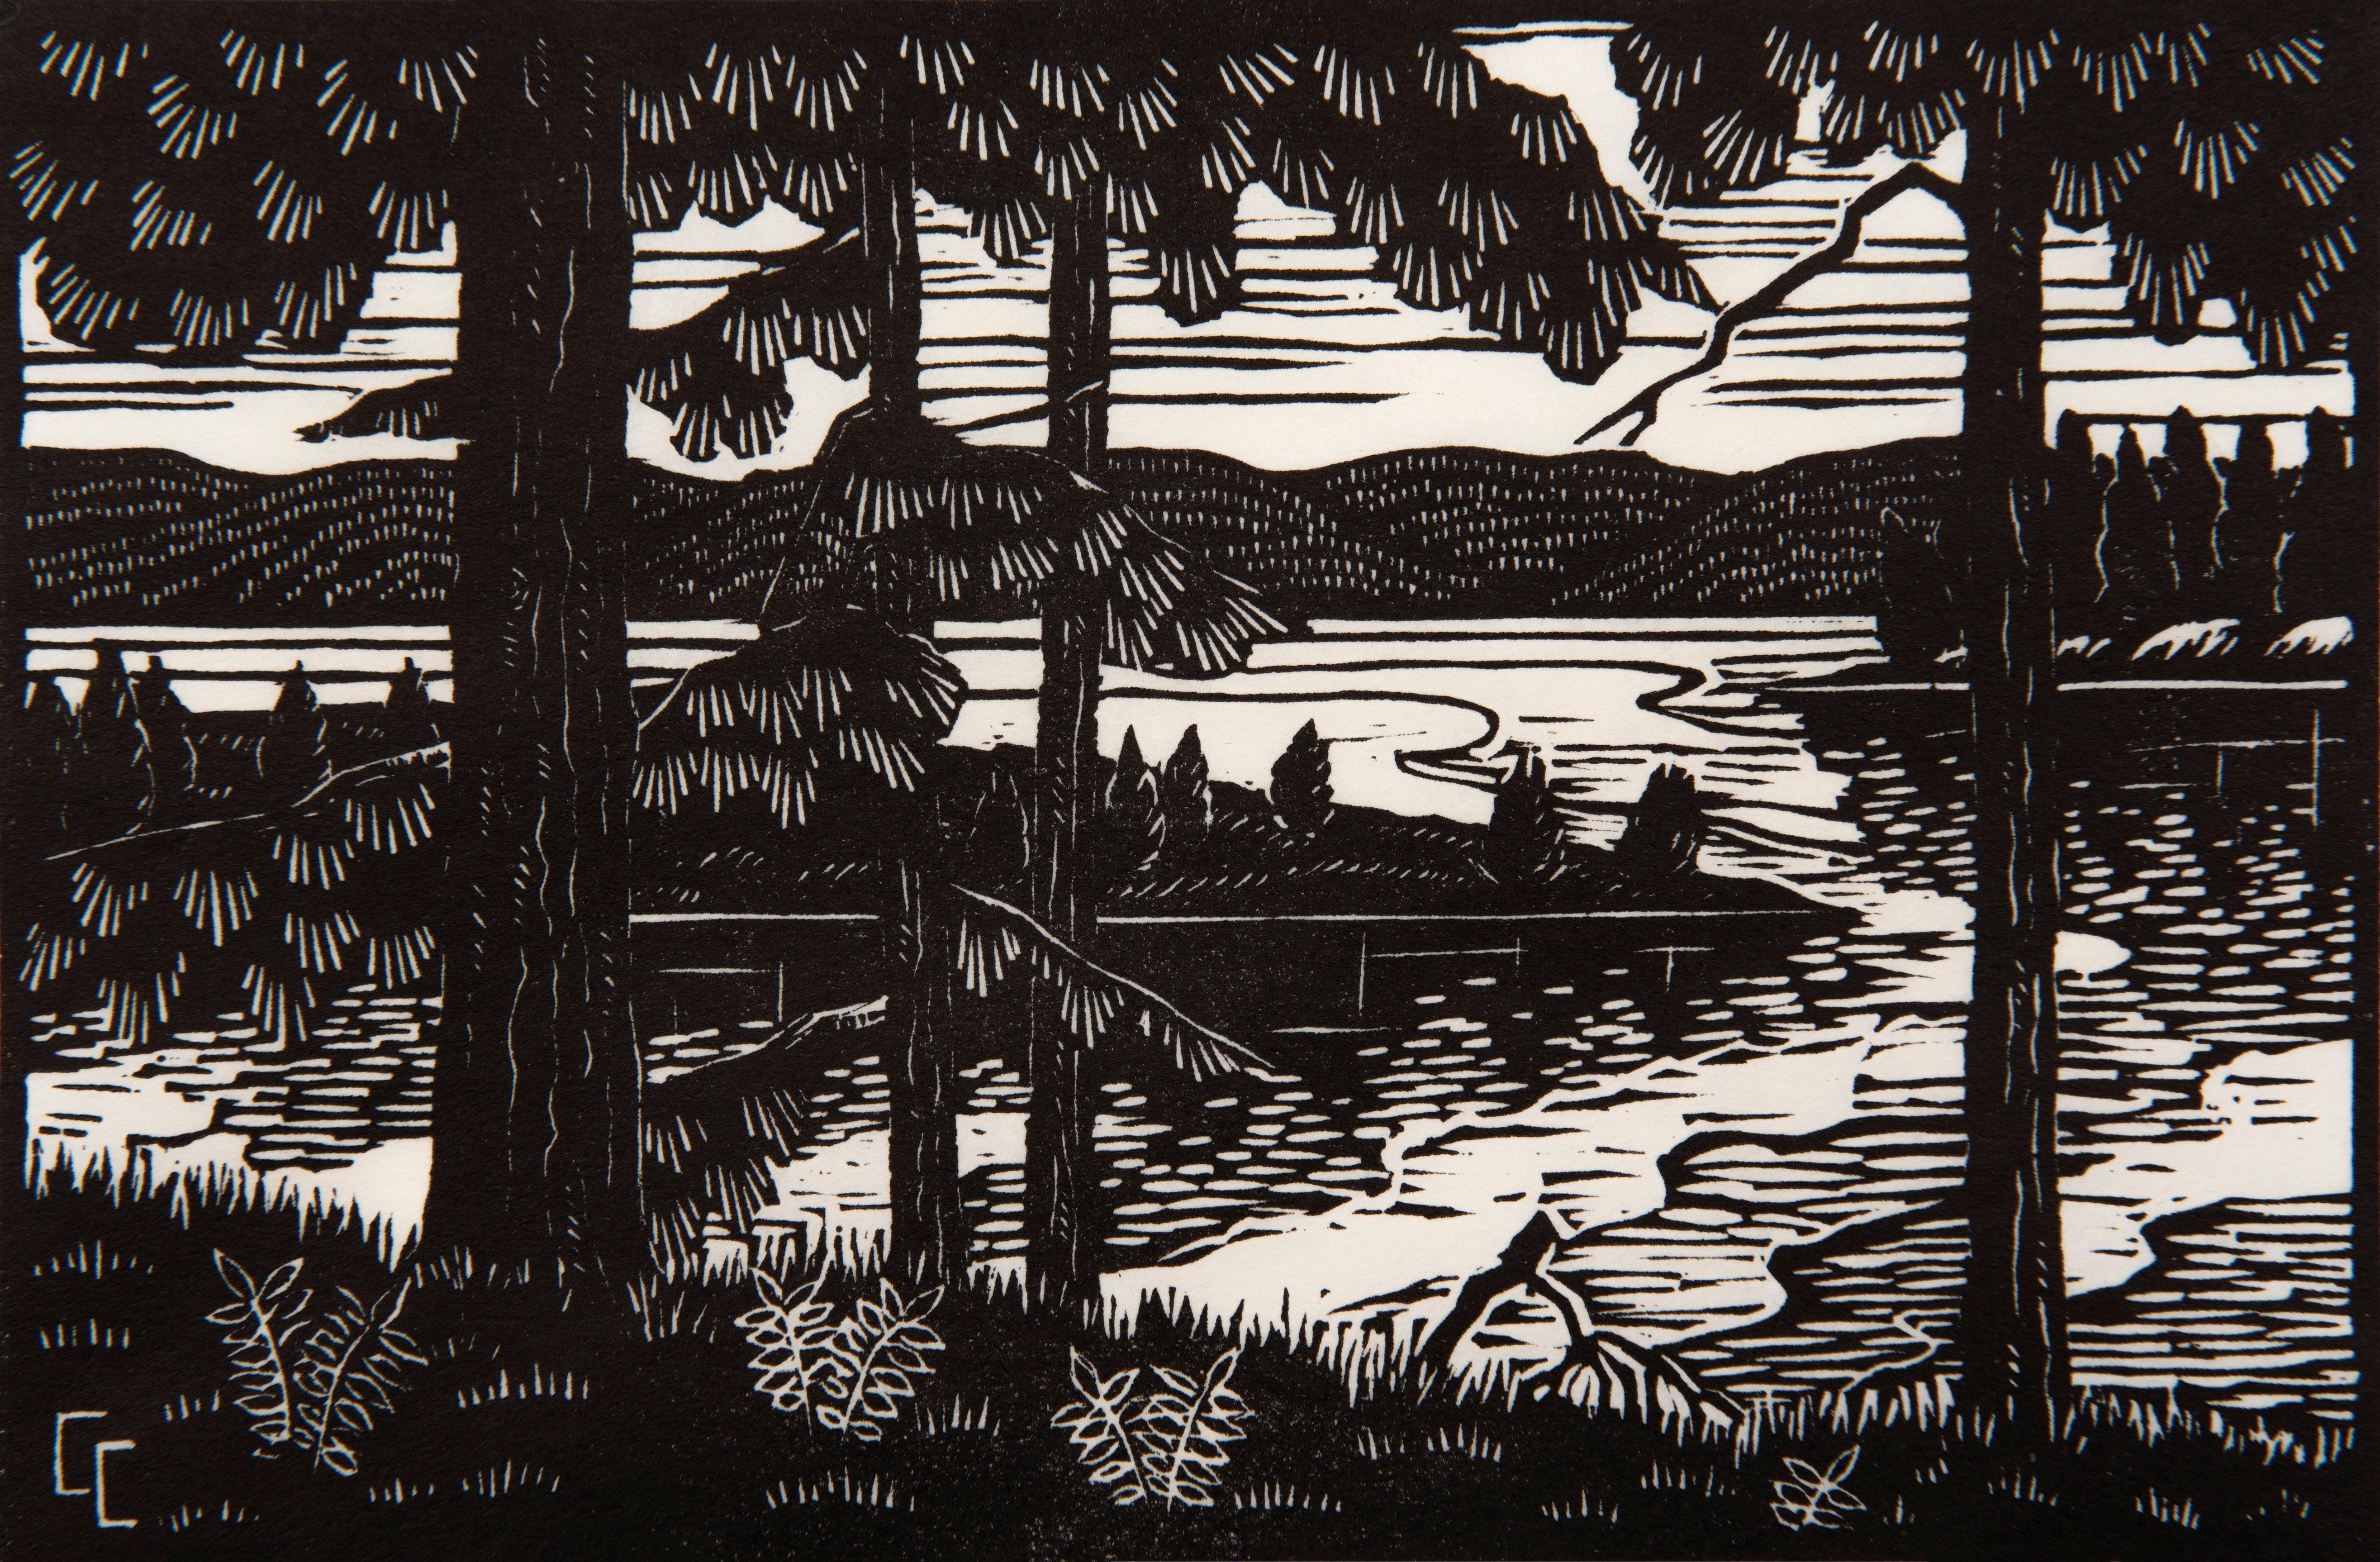 Carolyn Curtis,  Northern Lake, 1943, Linocut print